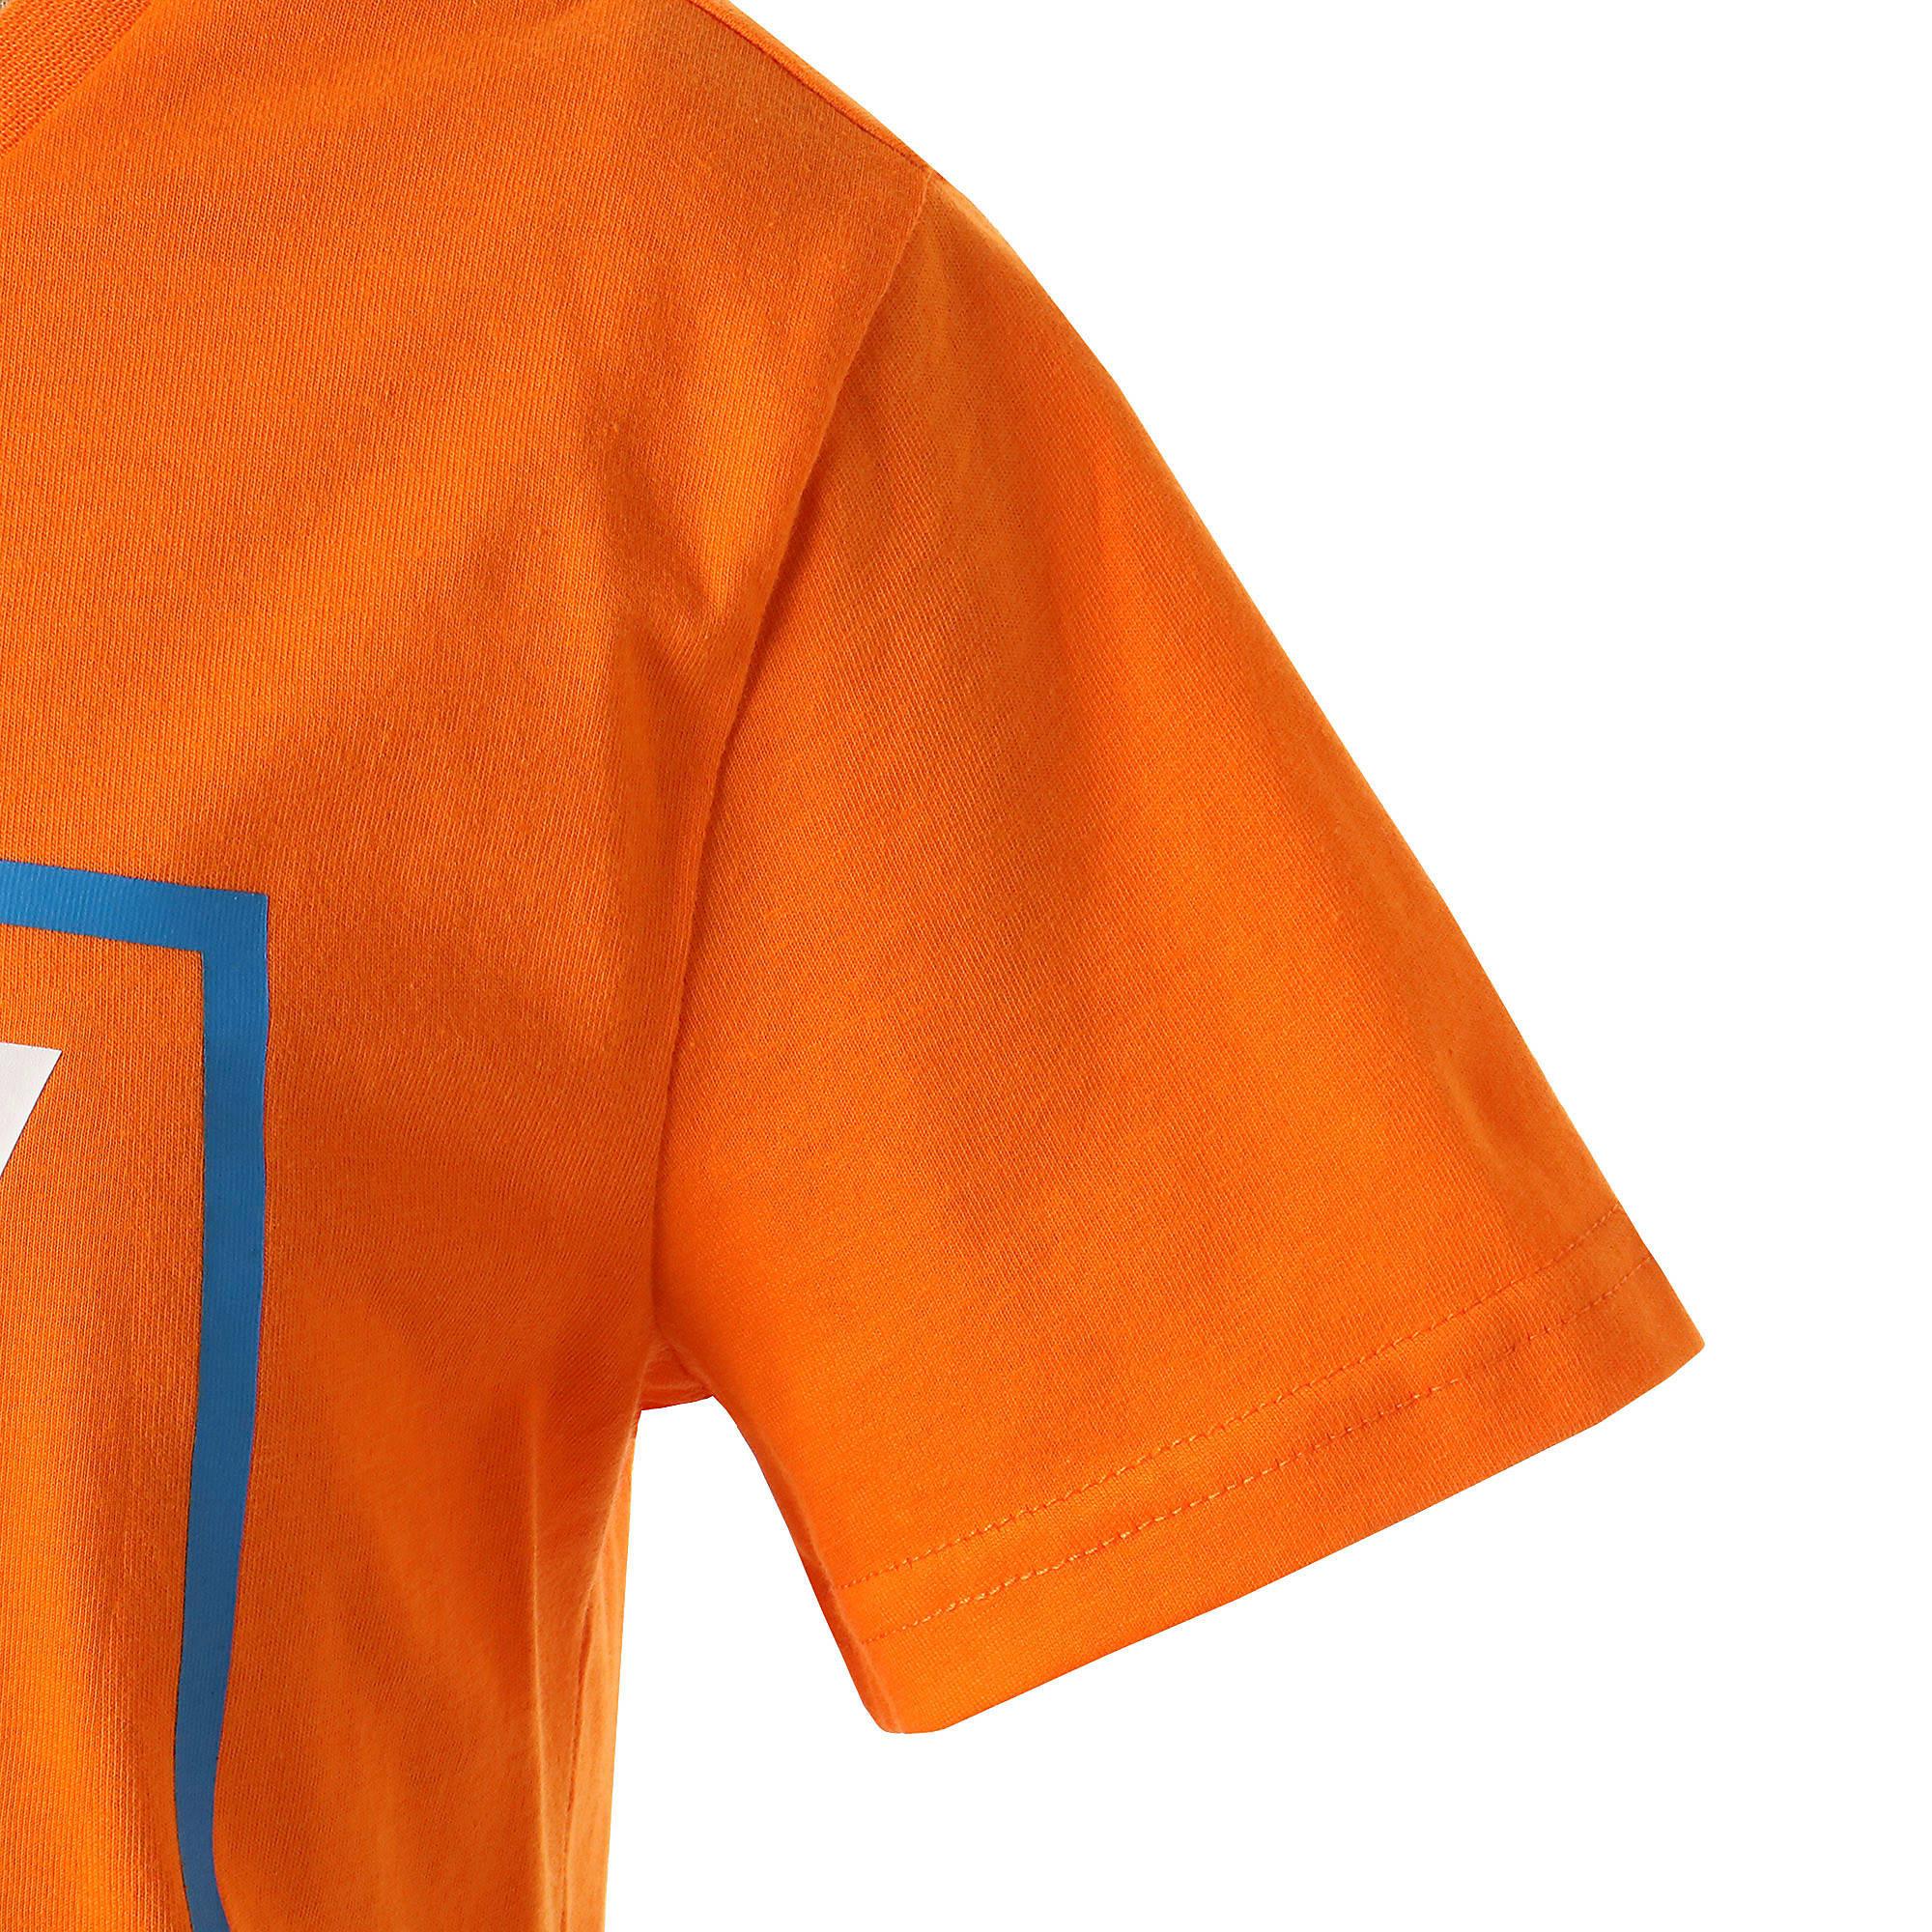 Thumbnail 5 of キッズ ALPHA SS グラフィック Tシャツ 半袖, Orange Popsicle, medium-JPN